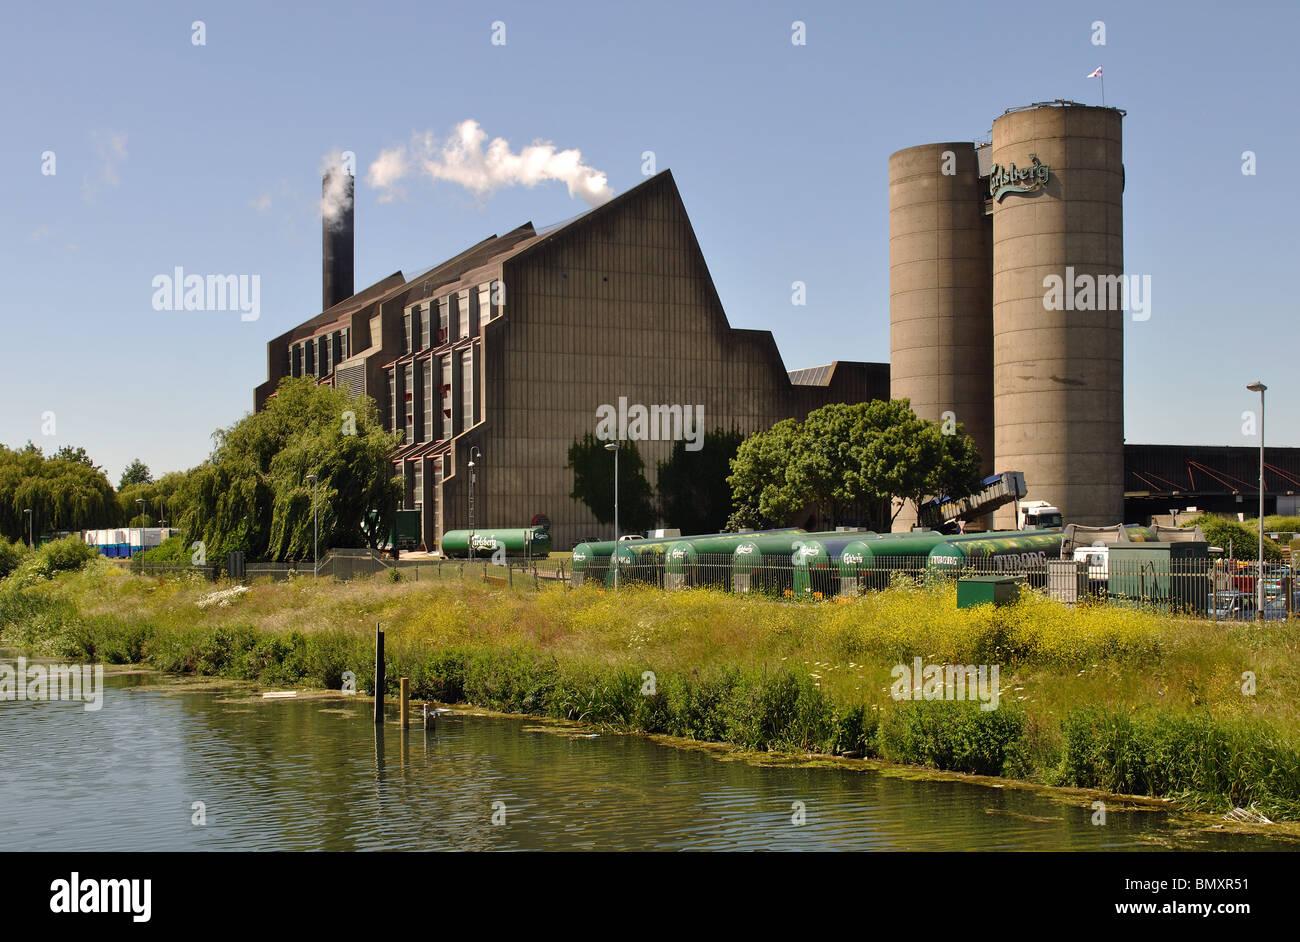 Carlsbery Brewery and River Nene, Northampton, Northamptonshire, England, UK - Stock Image